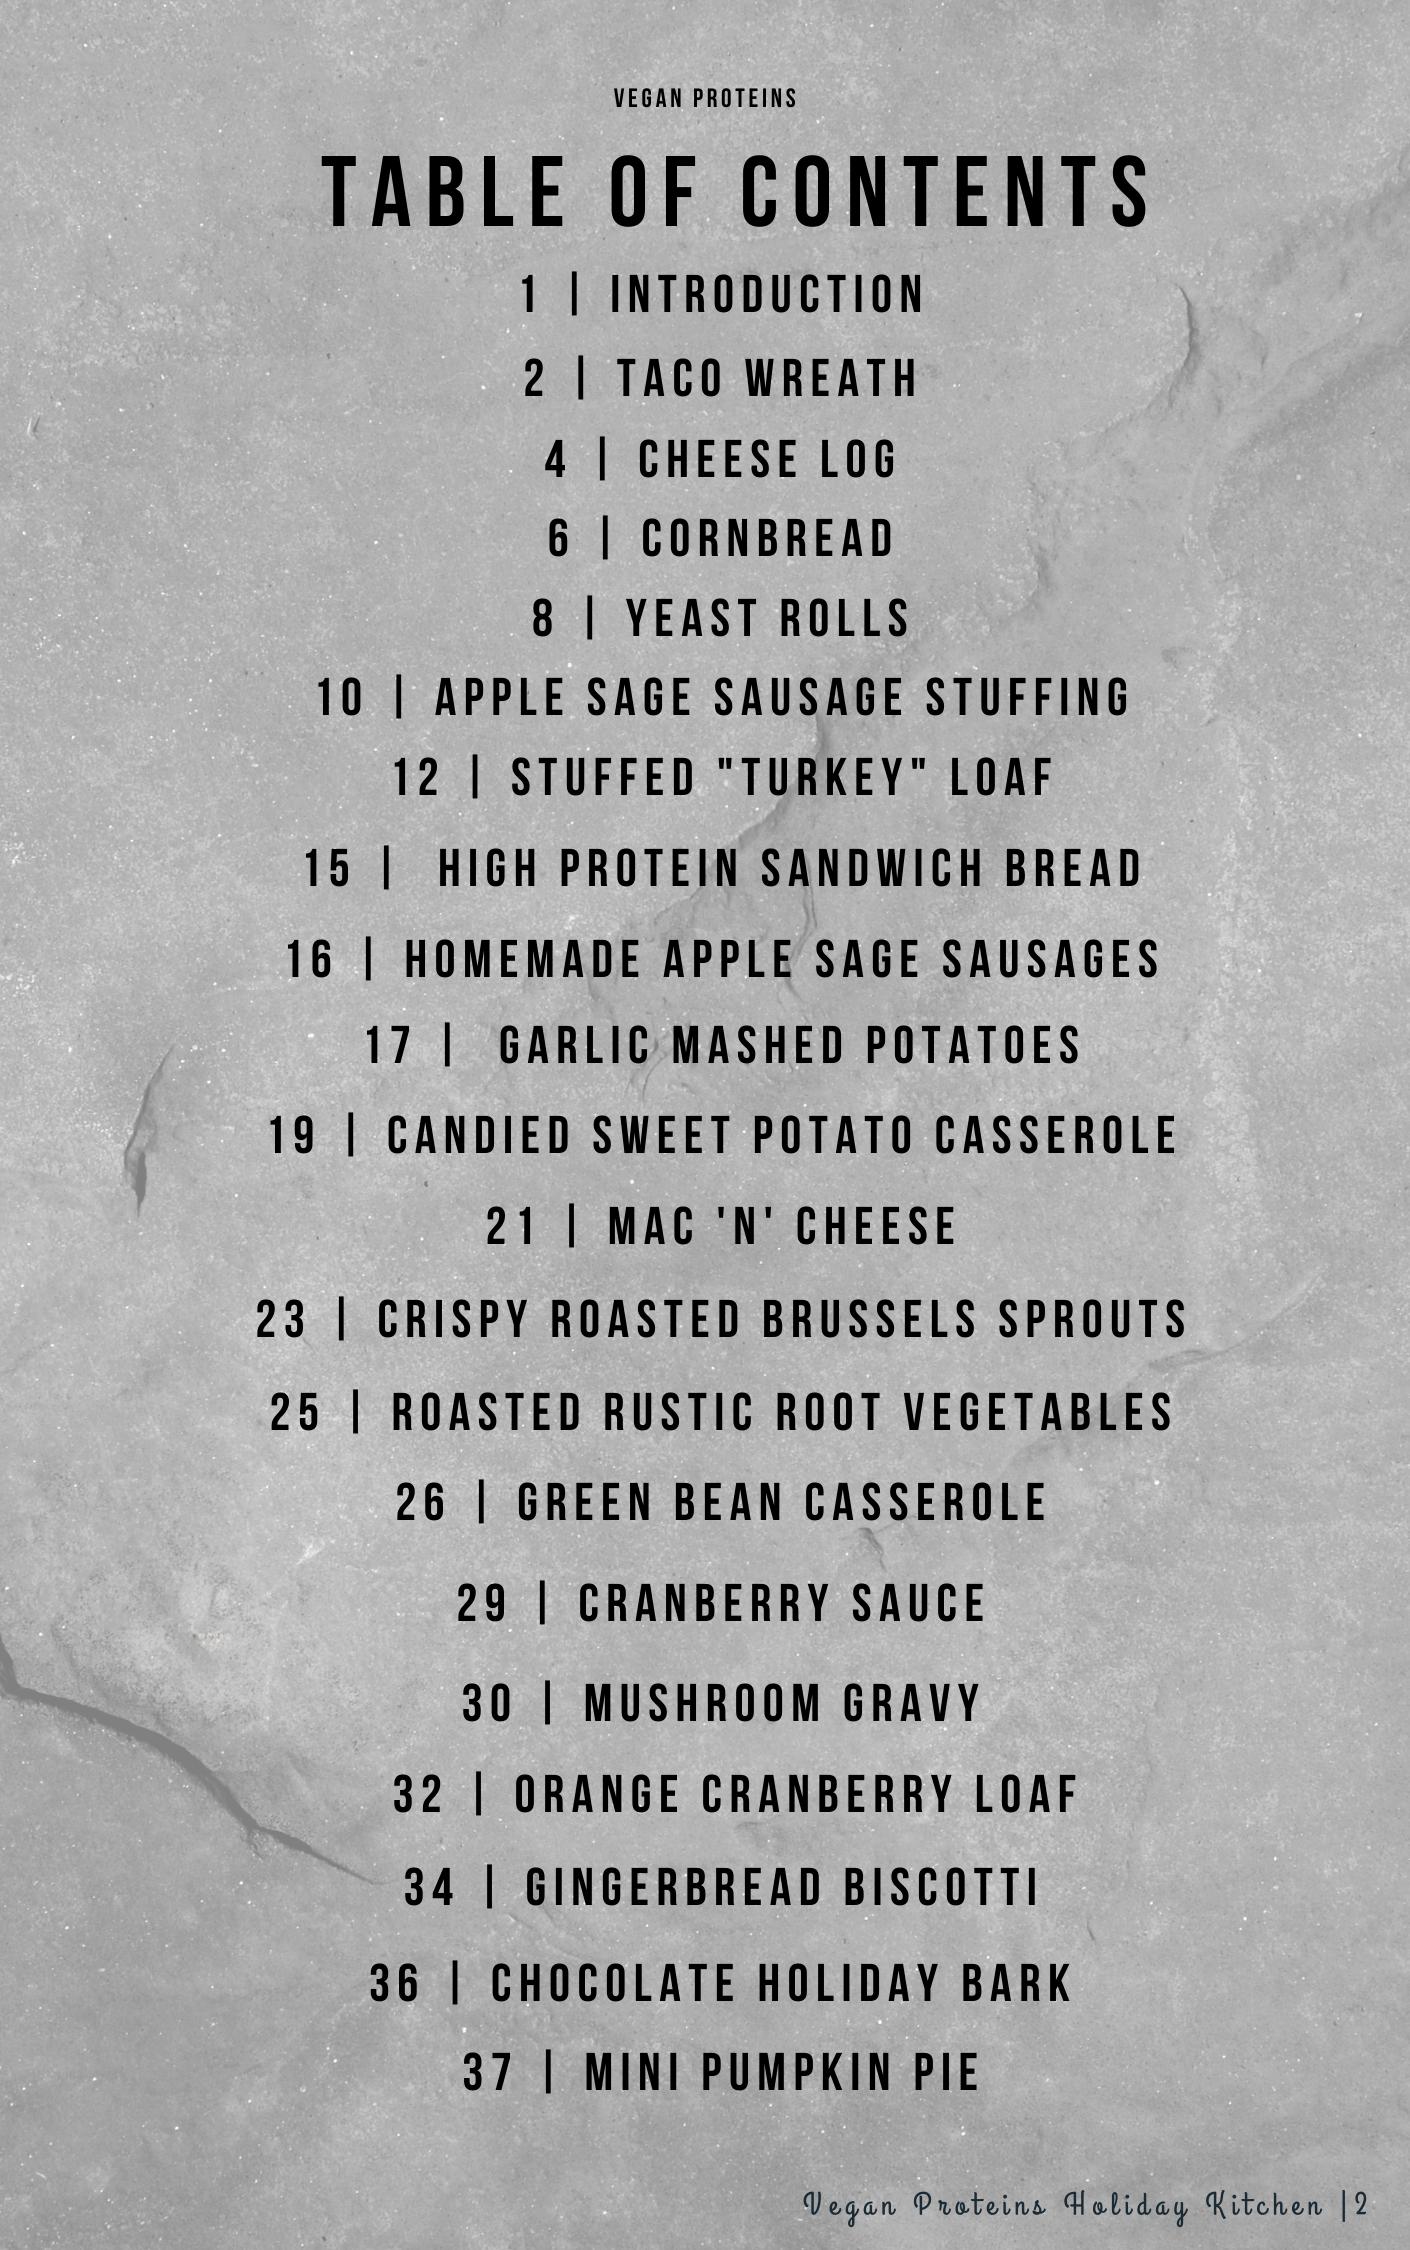 Vegan Proteins Holiday Kitchen Cookbook (E-Book)